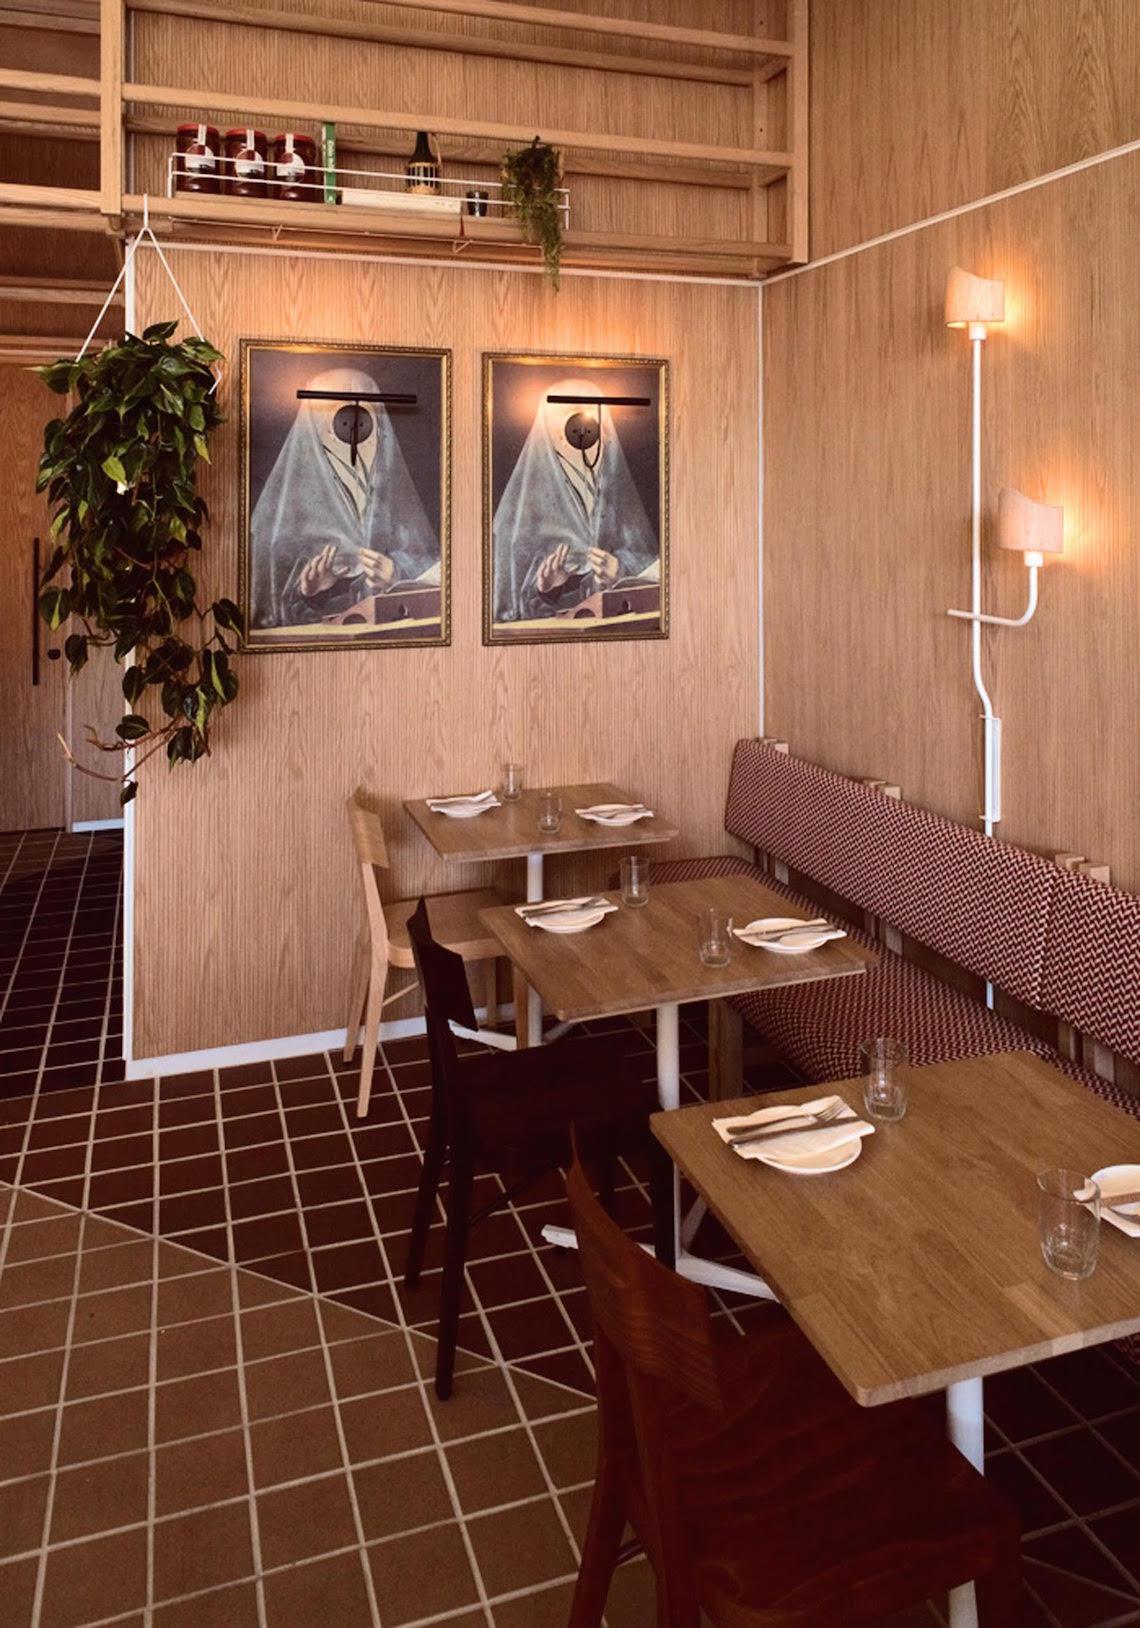 Mount Pleasant Welcomes Italian Restaurant Osteria Savio Volpe to Kingsway